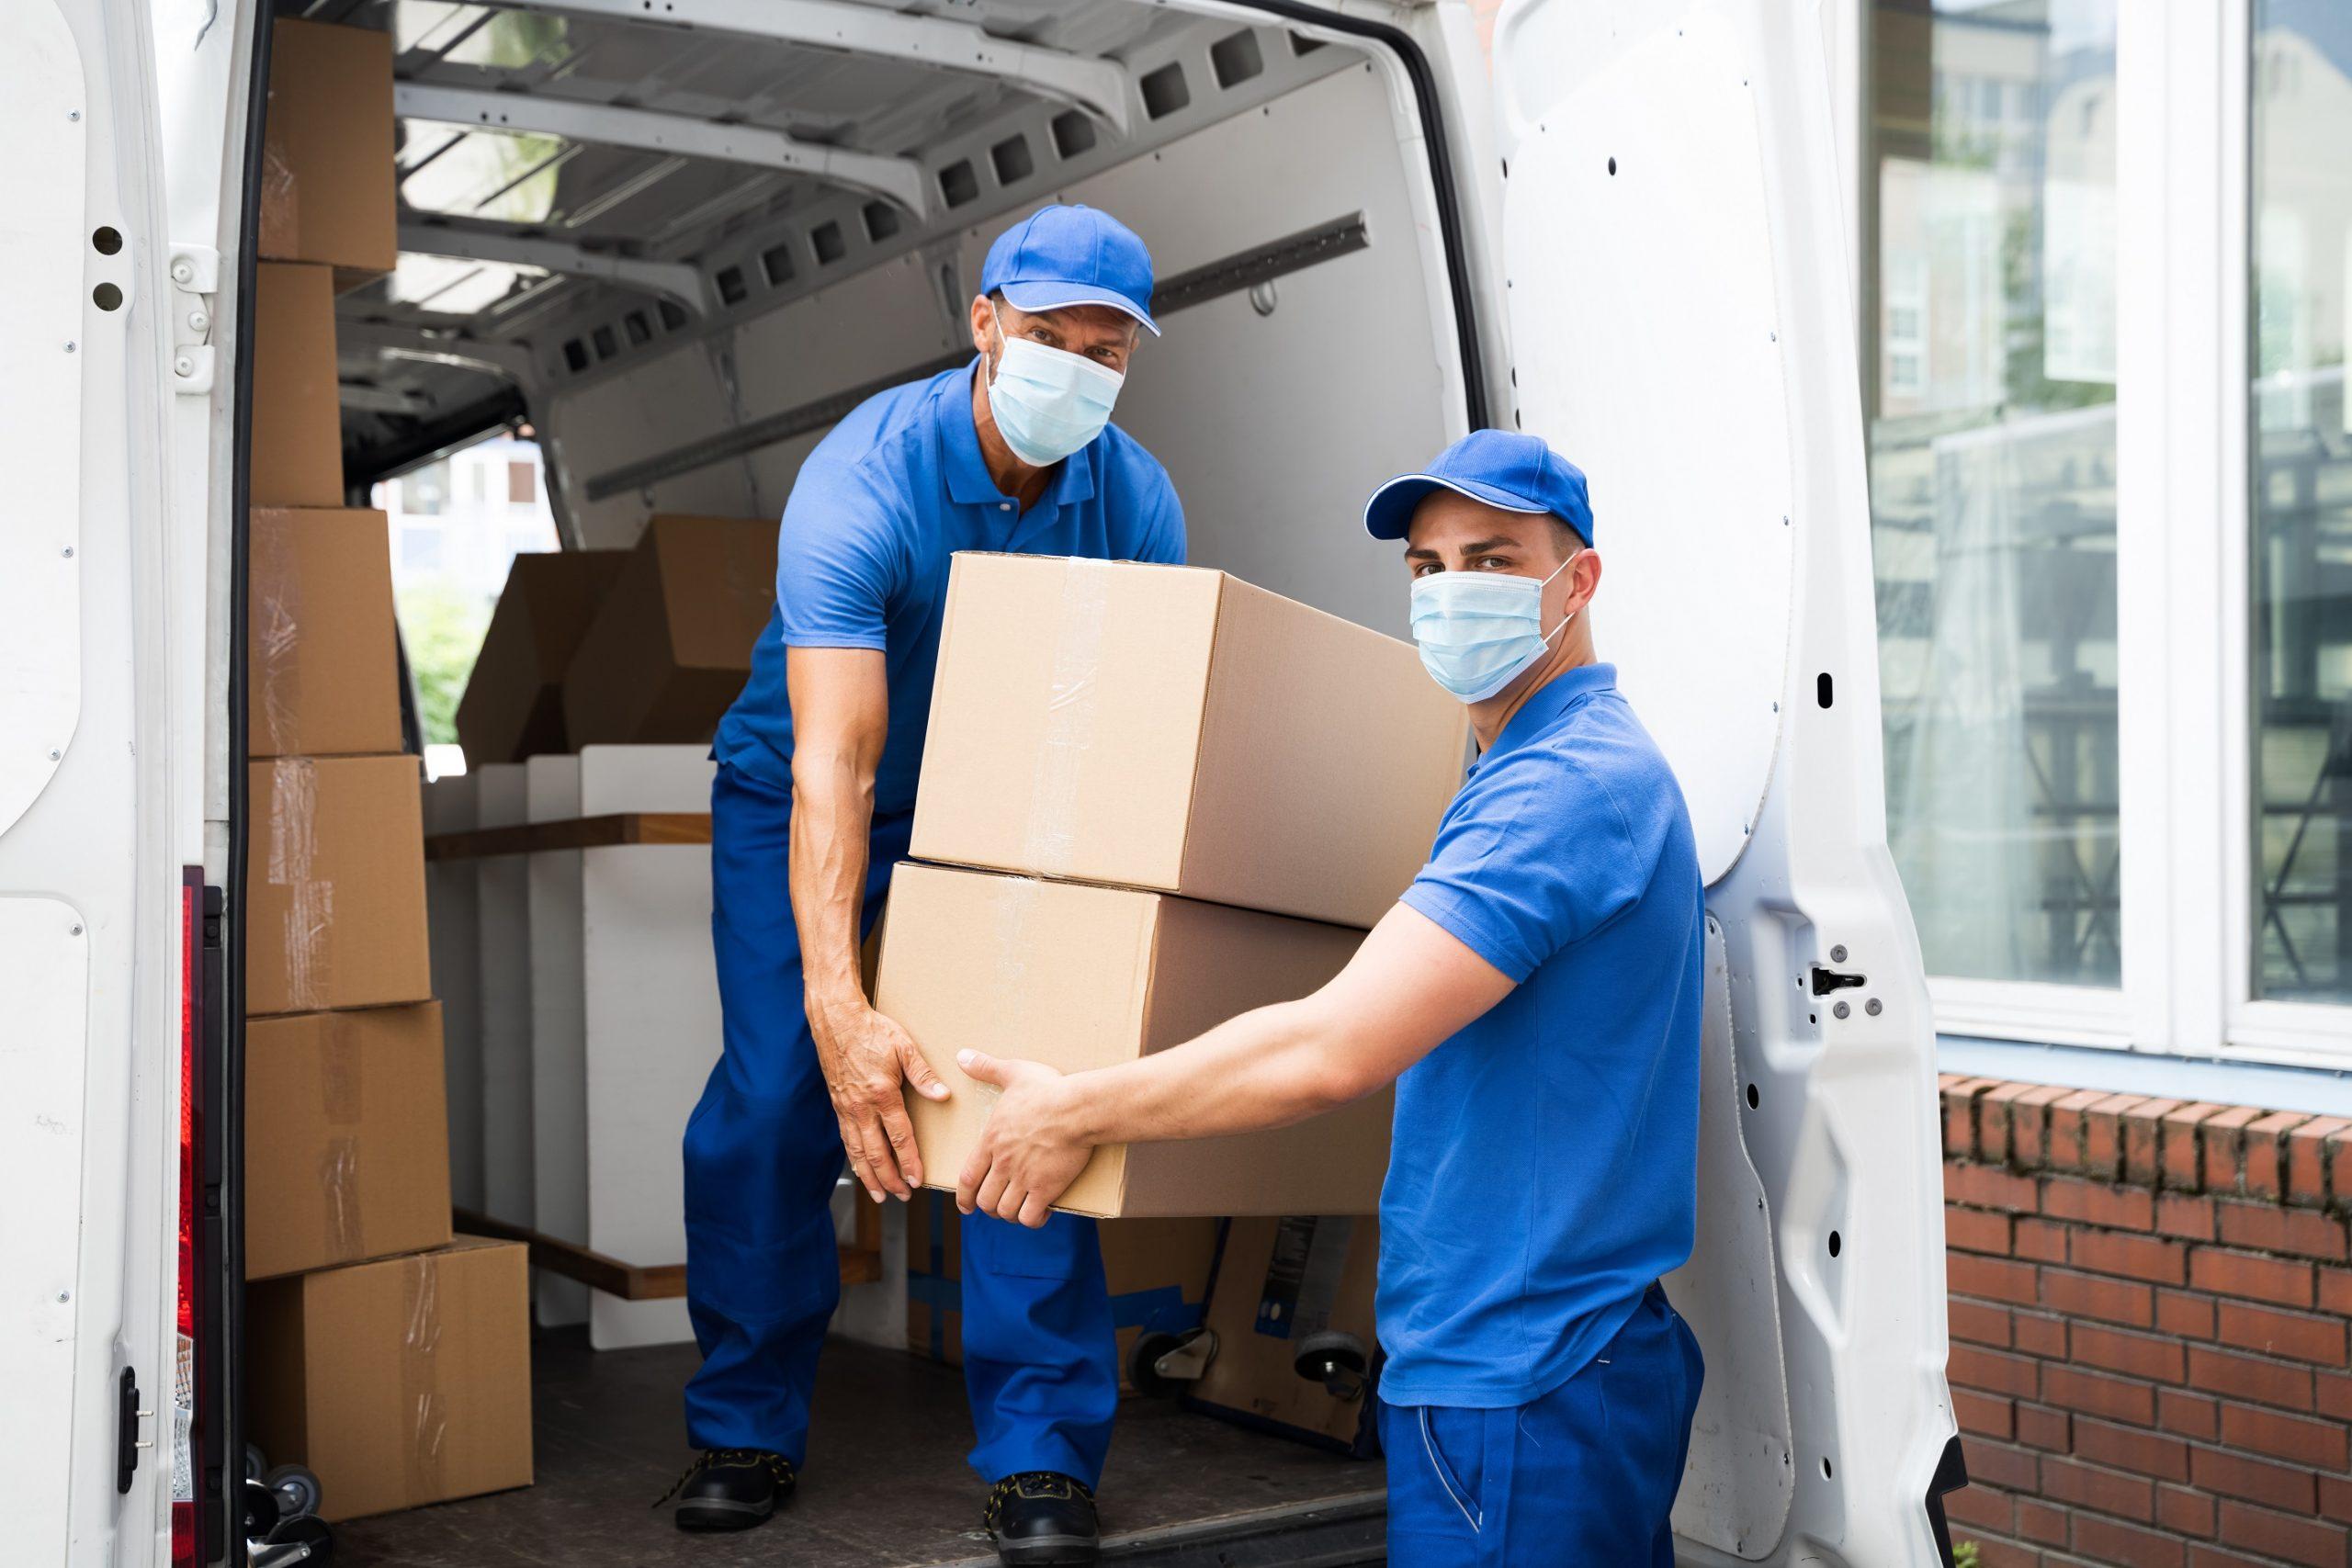 Men Unloading Cardboard Boxes